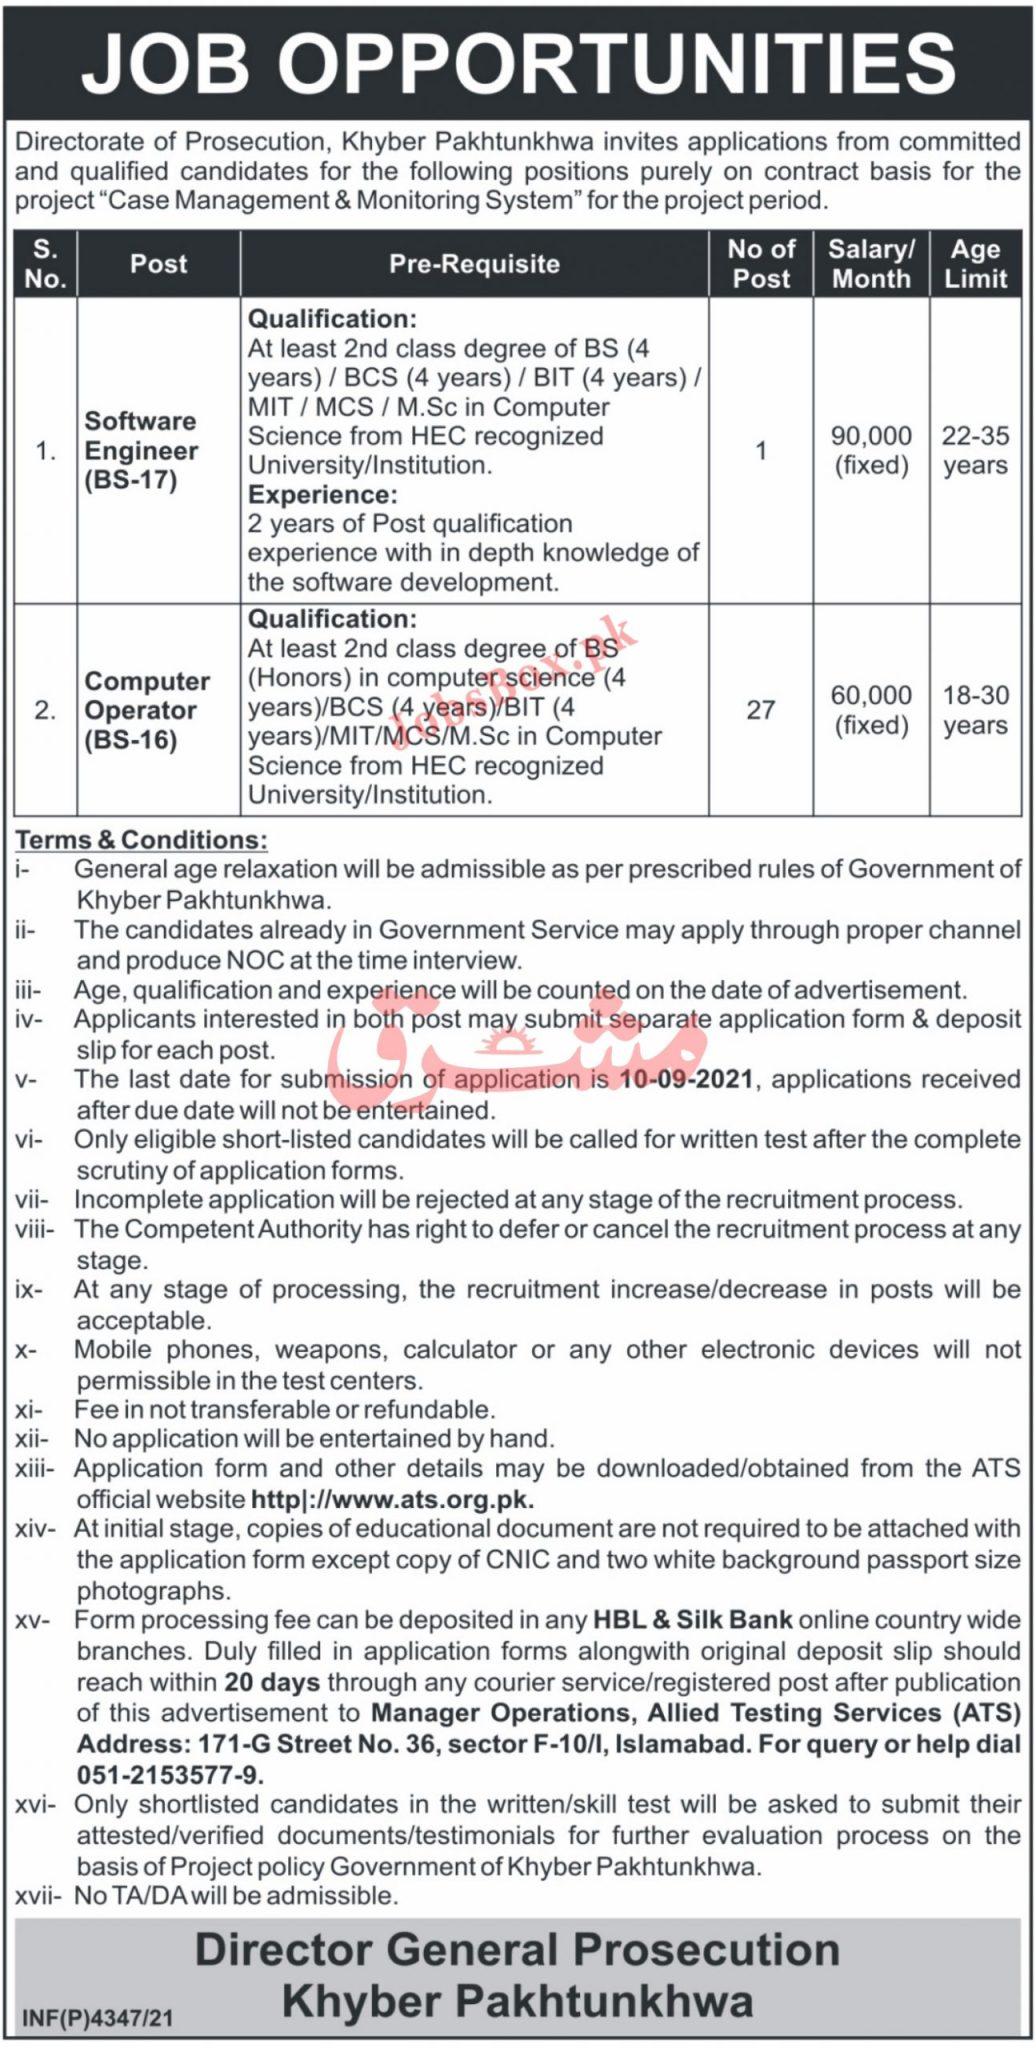 Directorate of Prosecution KPK Jobs 2021 via Application Form via ATS